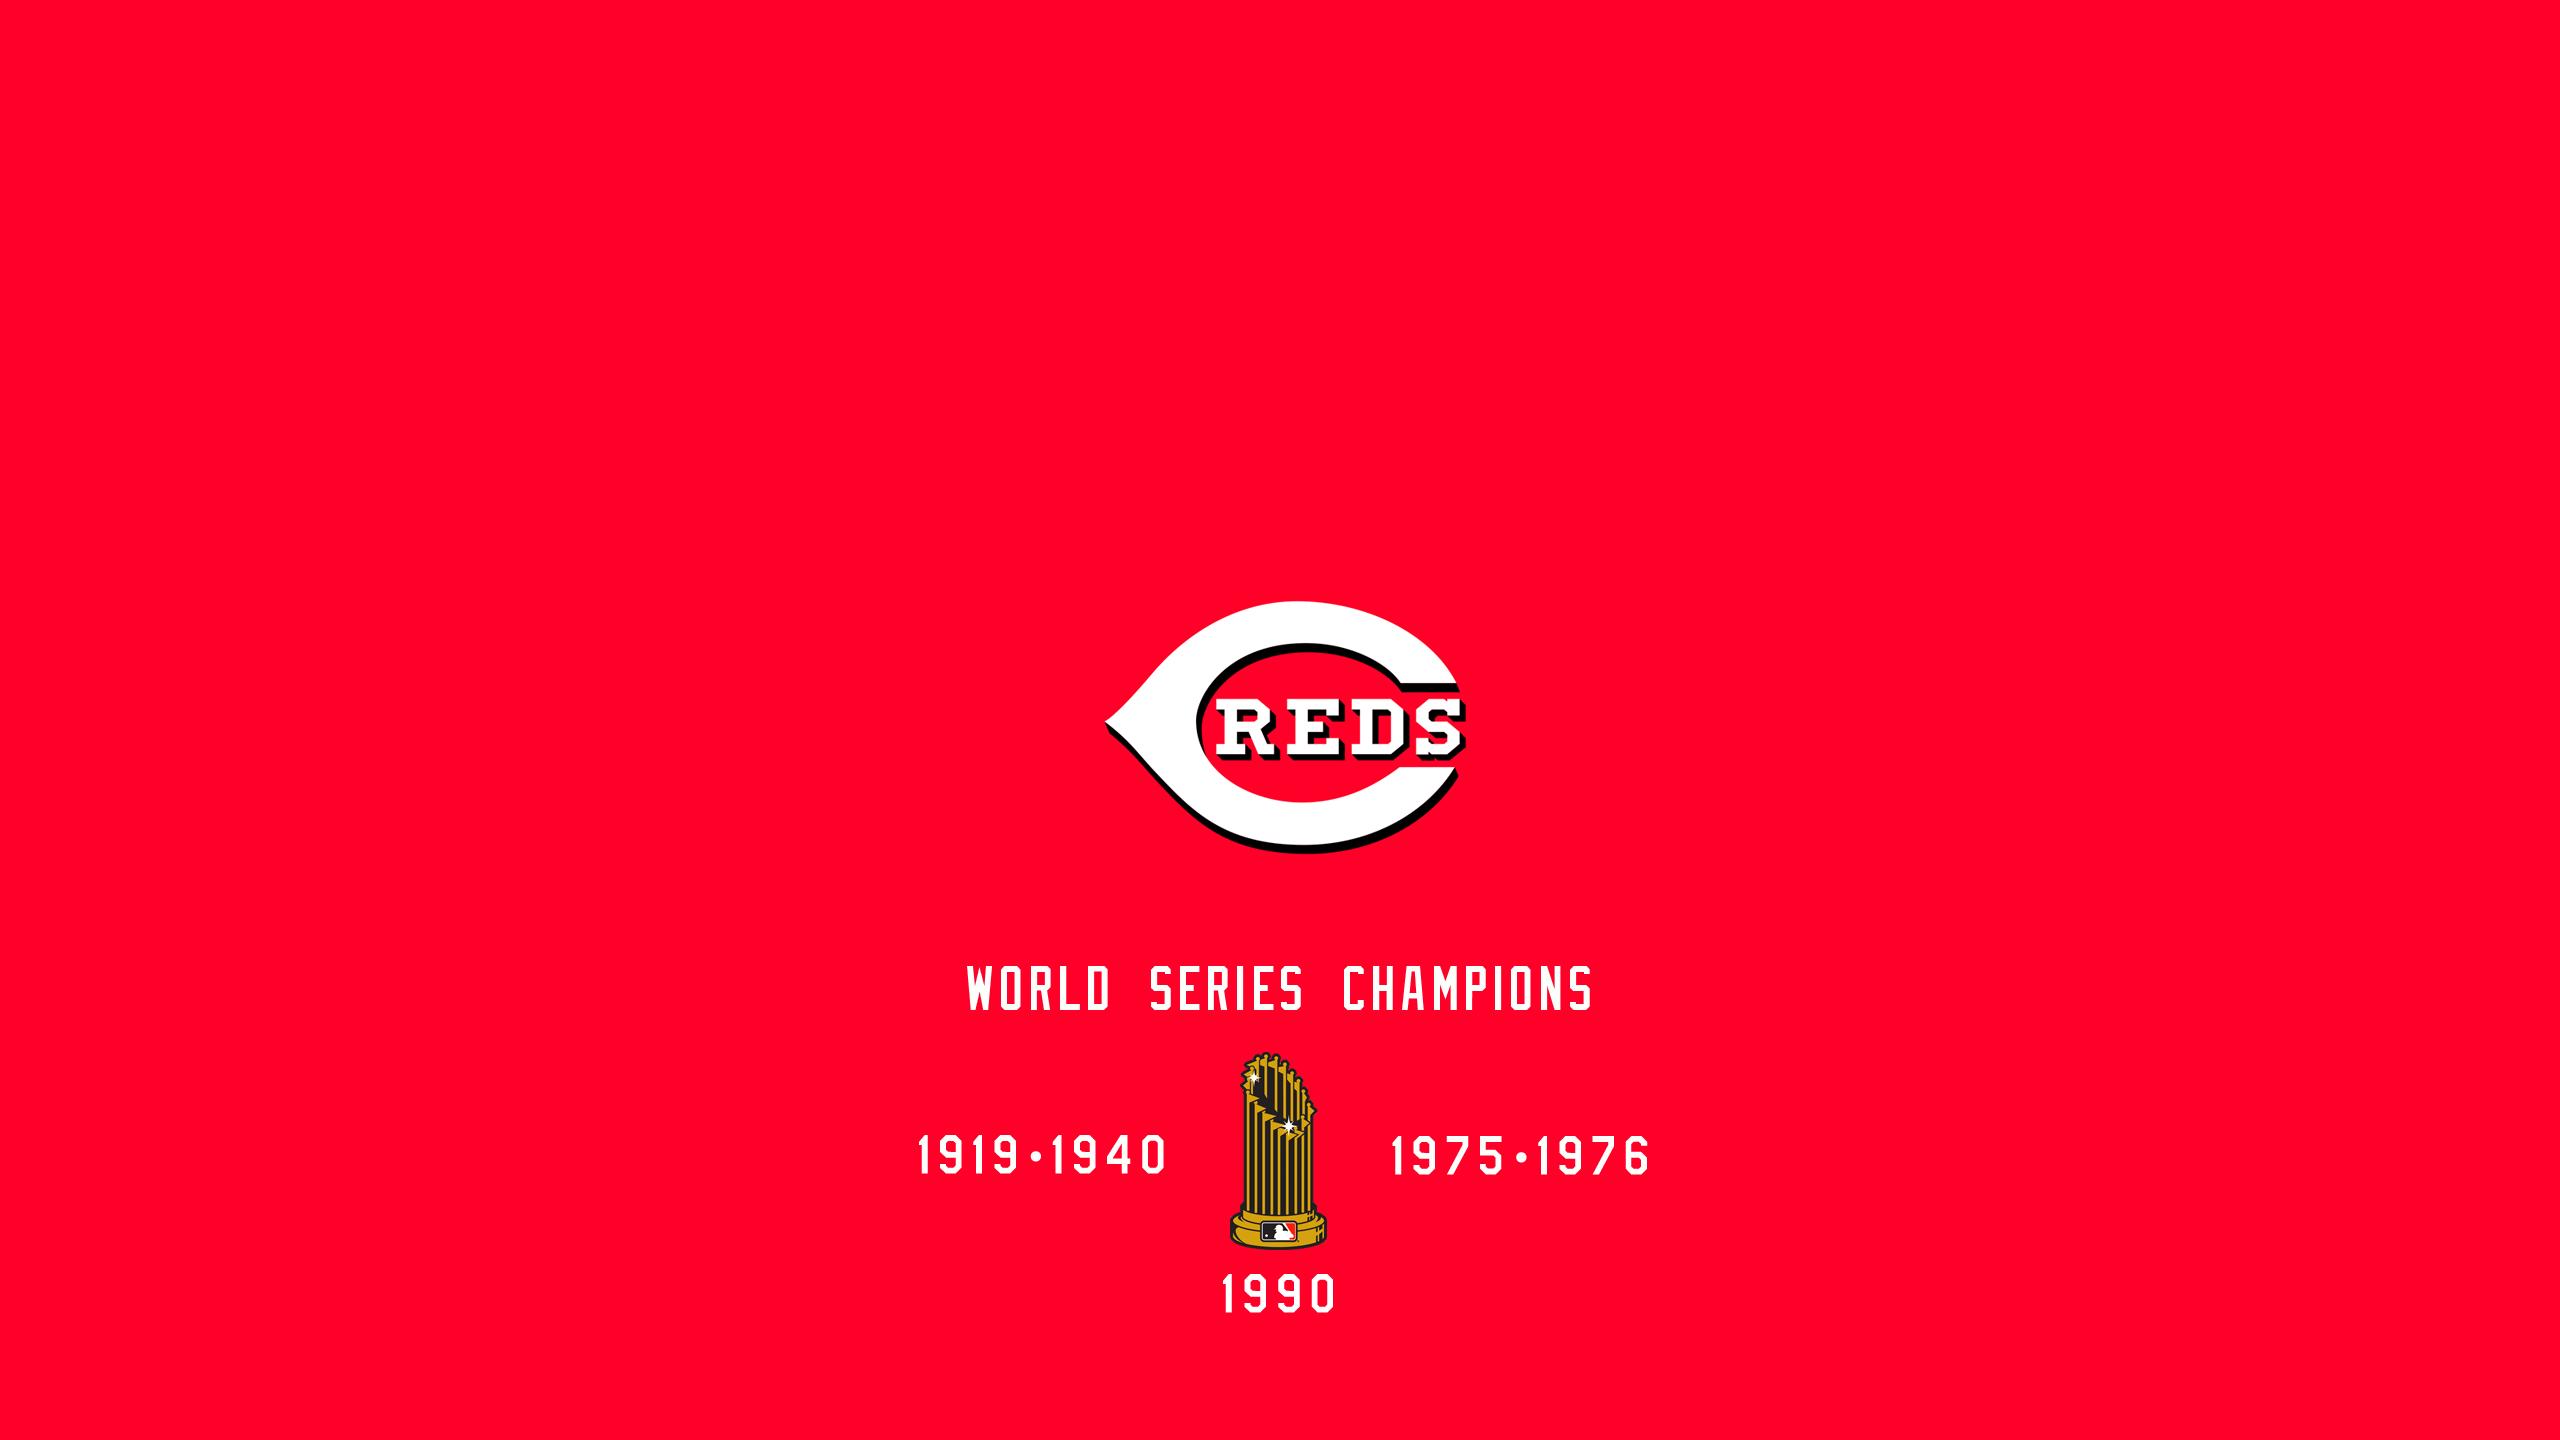 Cincinnati Reds - World Series Champs